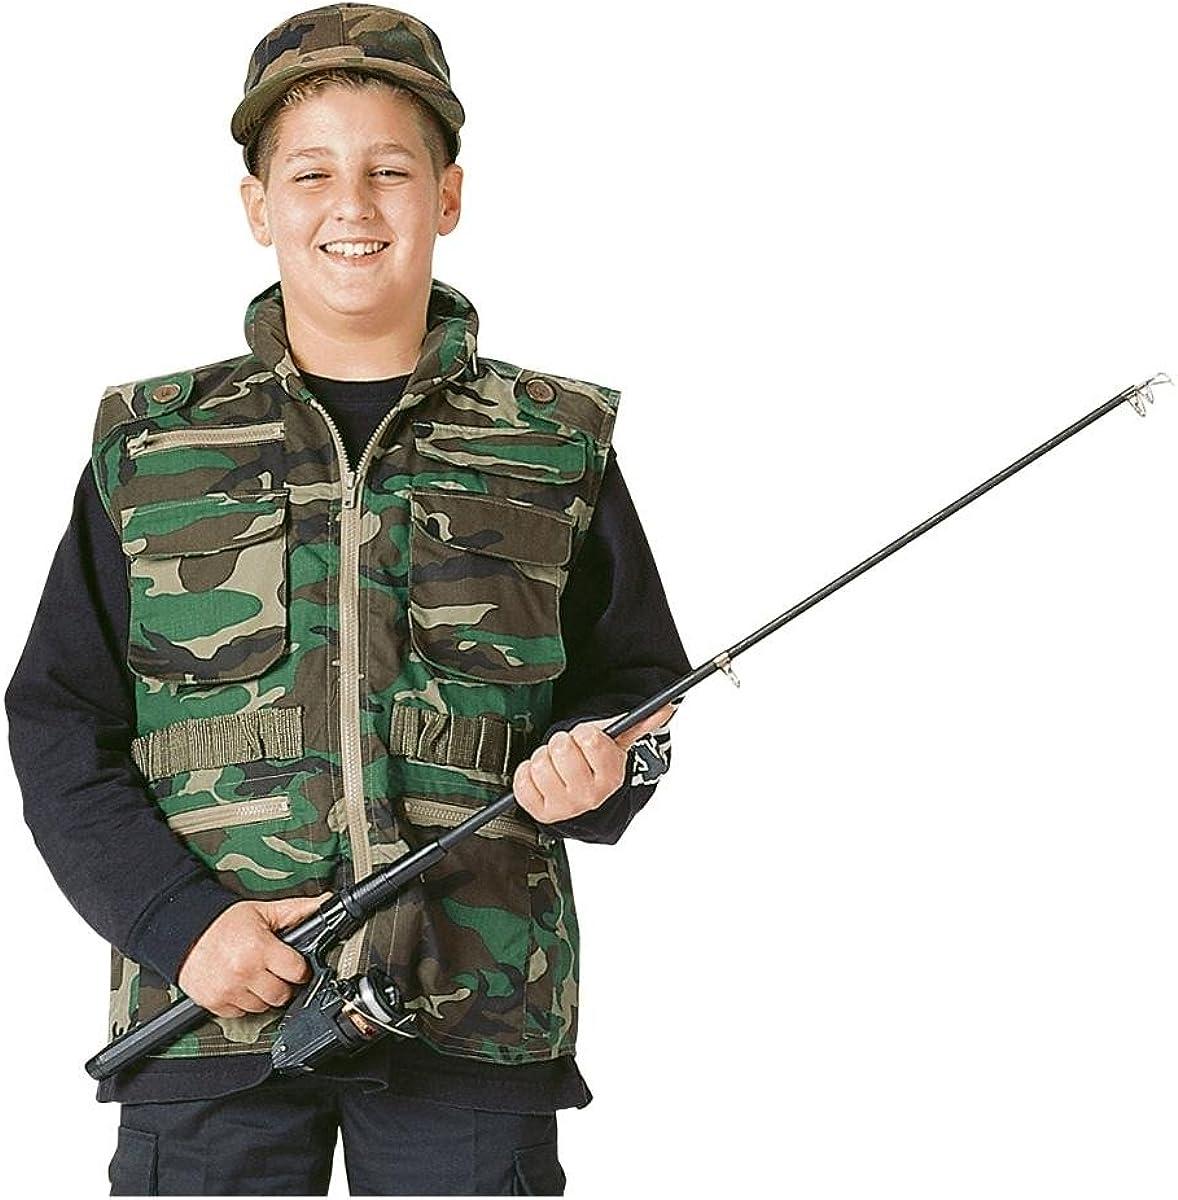 Max 46% OFF Rothco Kids Ranger Vest Fashion - Woodland Camo